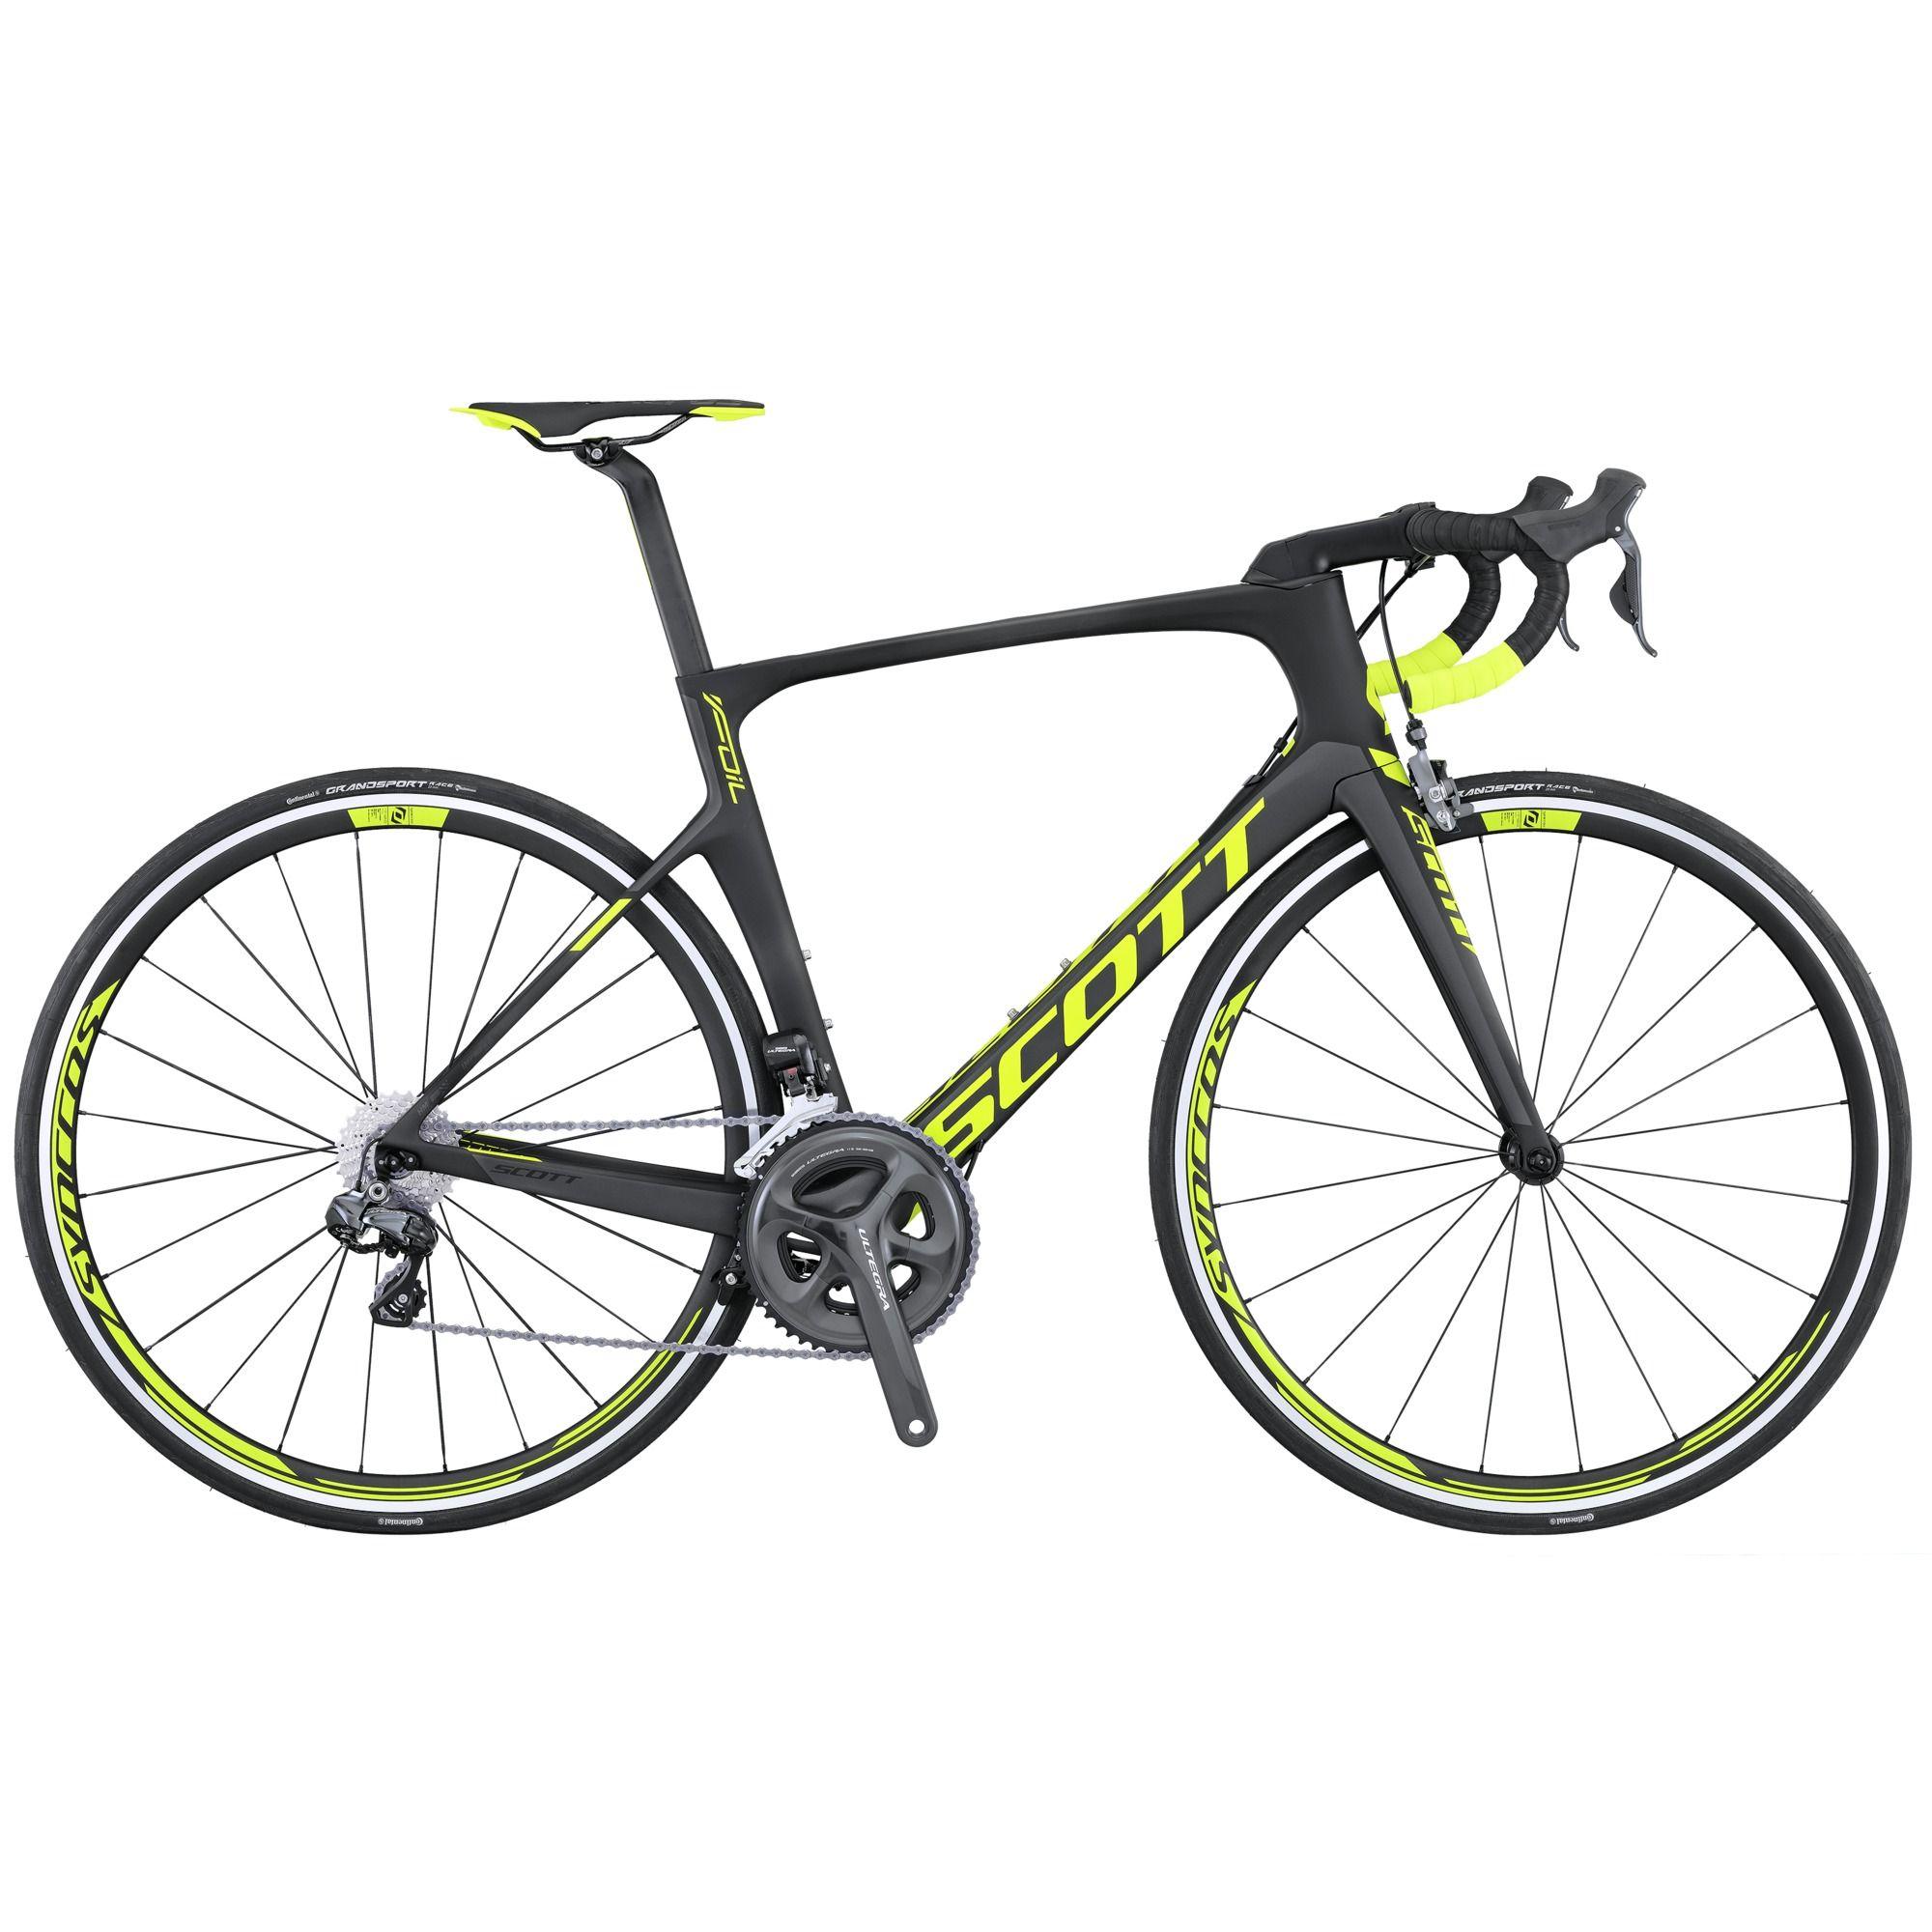 SCOTT Sports Bicicleta SCOTT Foil 10 Ciclismo, Assento